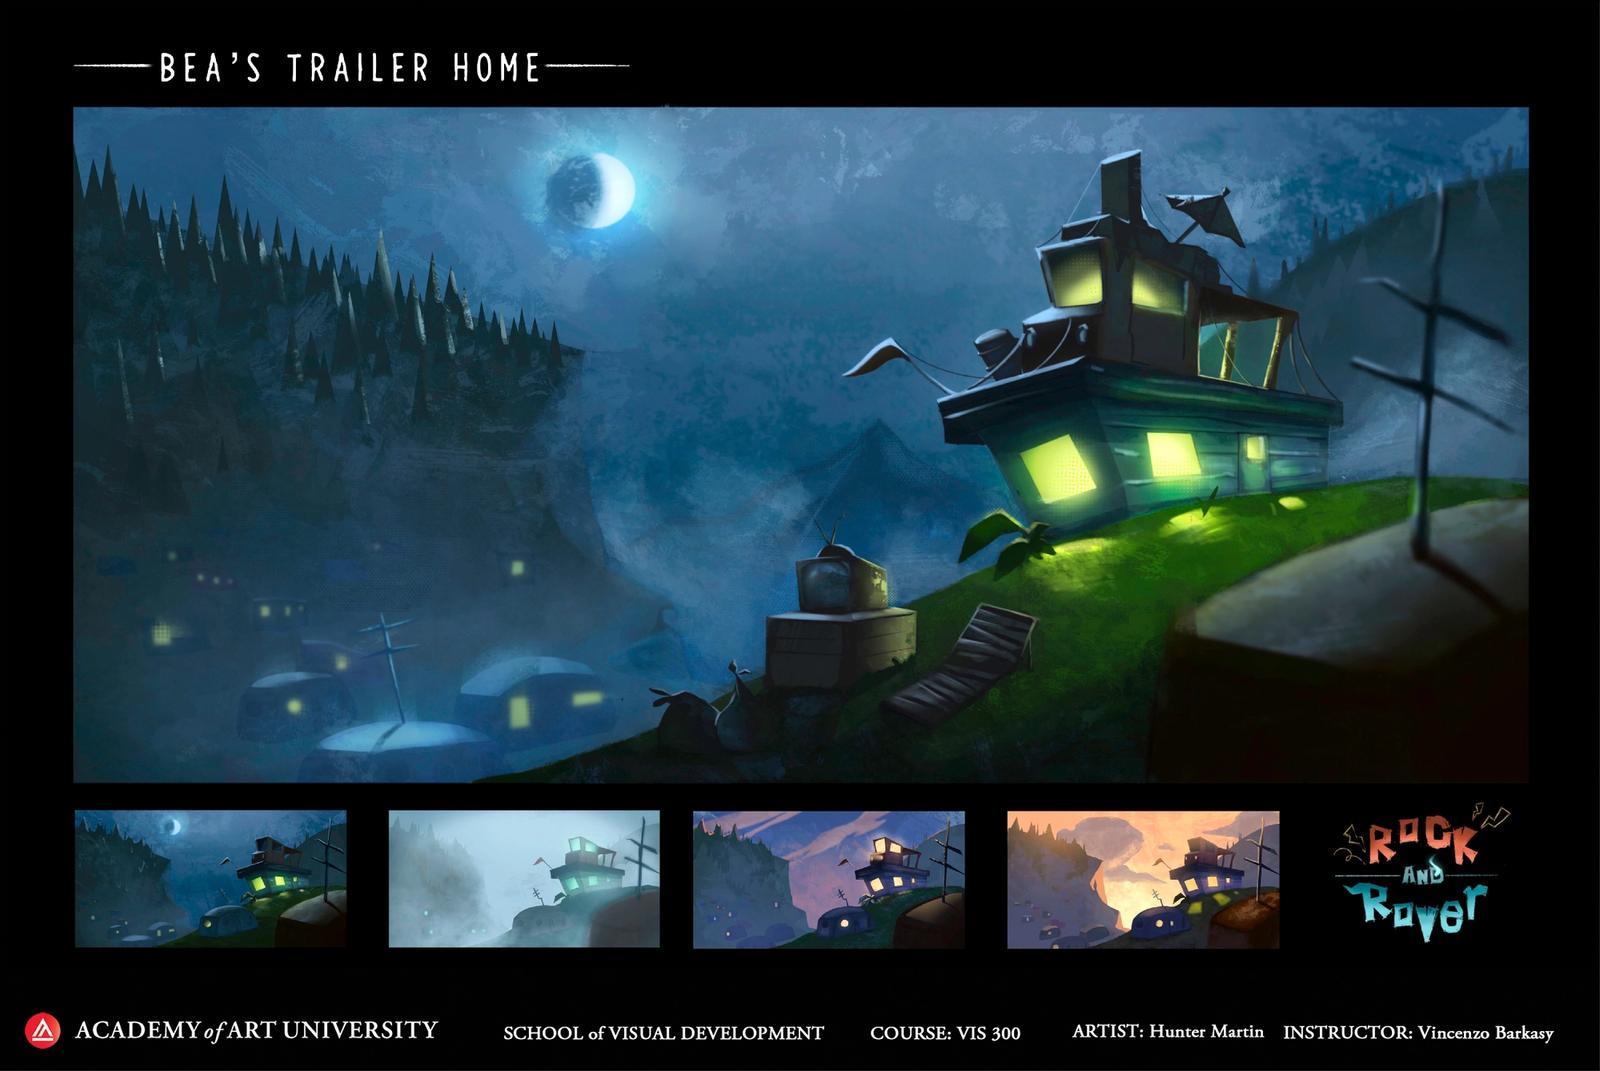 Bea's Trailer Home